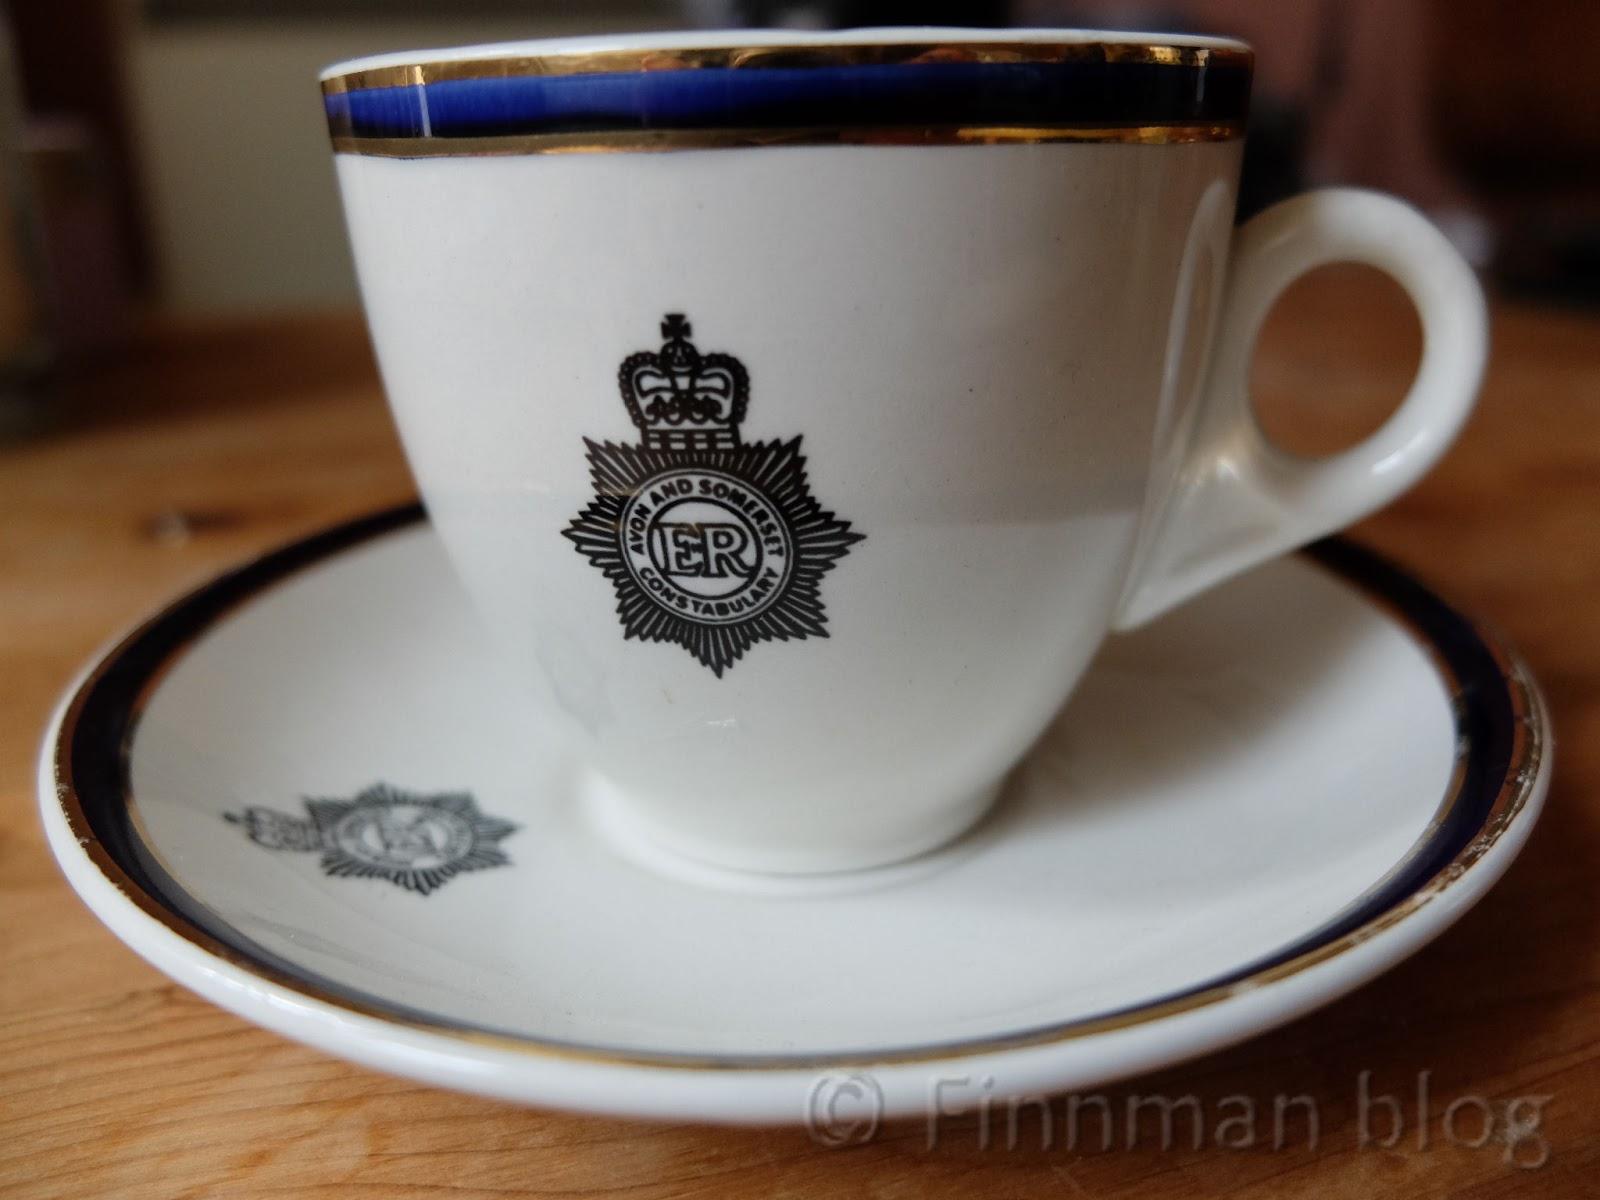 Avon & Somerset Constabulary Miscellaneous items